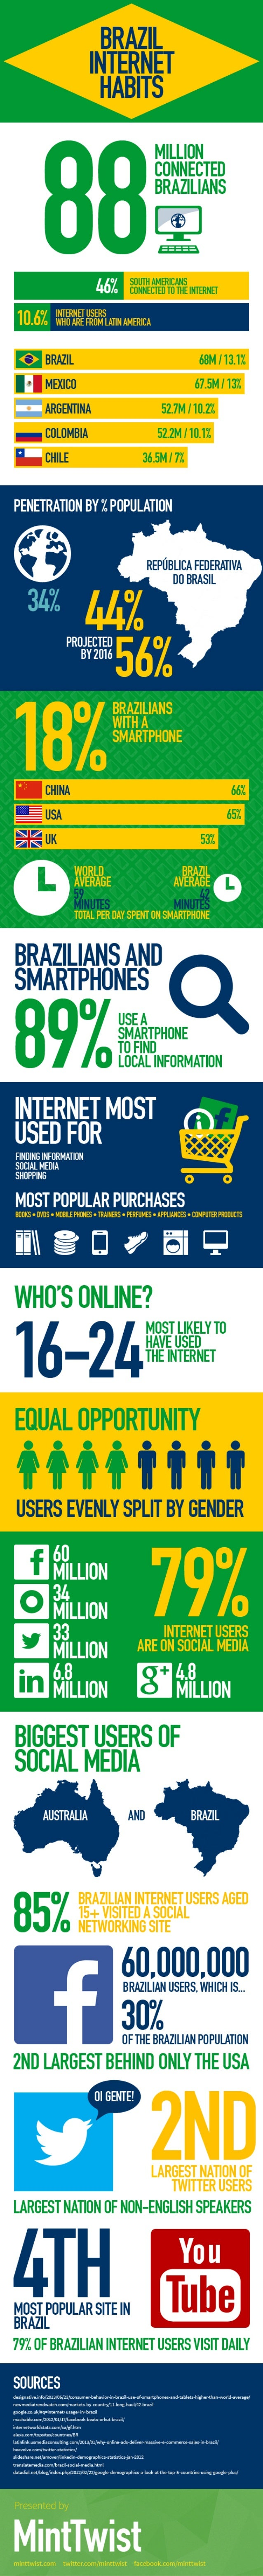 Brazil internet habits - infographic